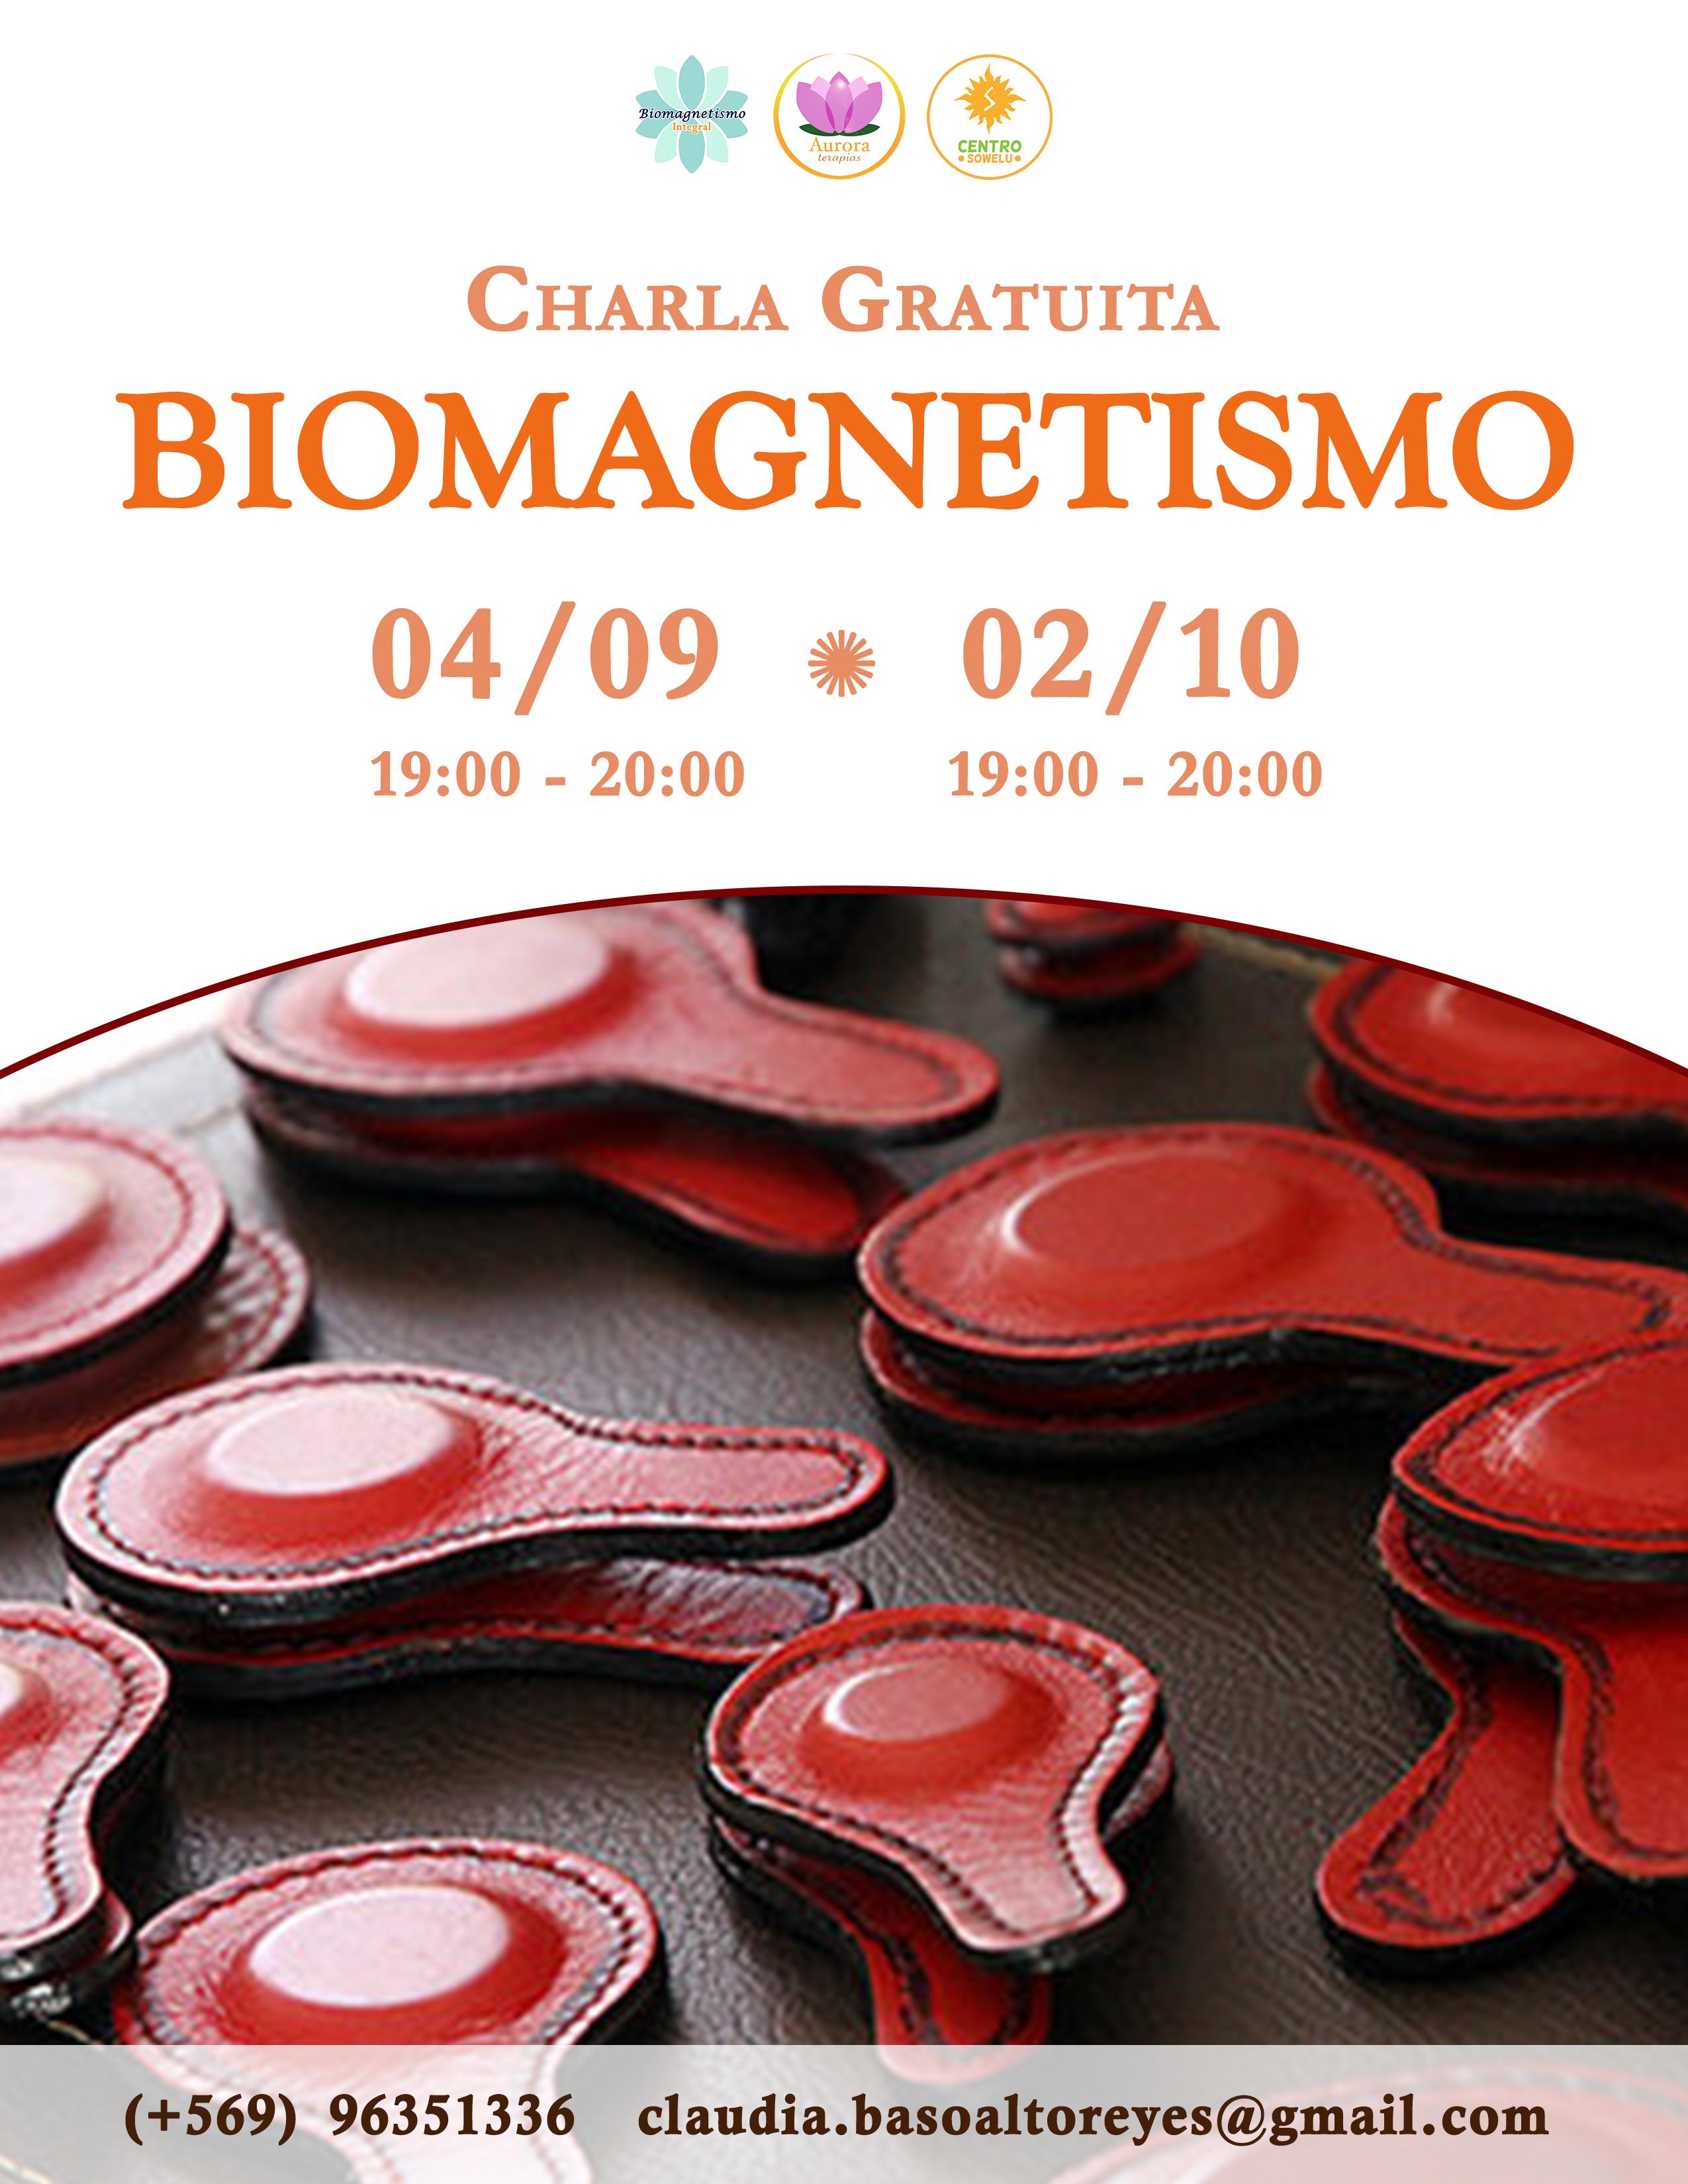 Charla GRATUITA Biomagnetismo